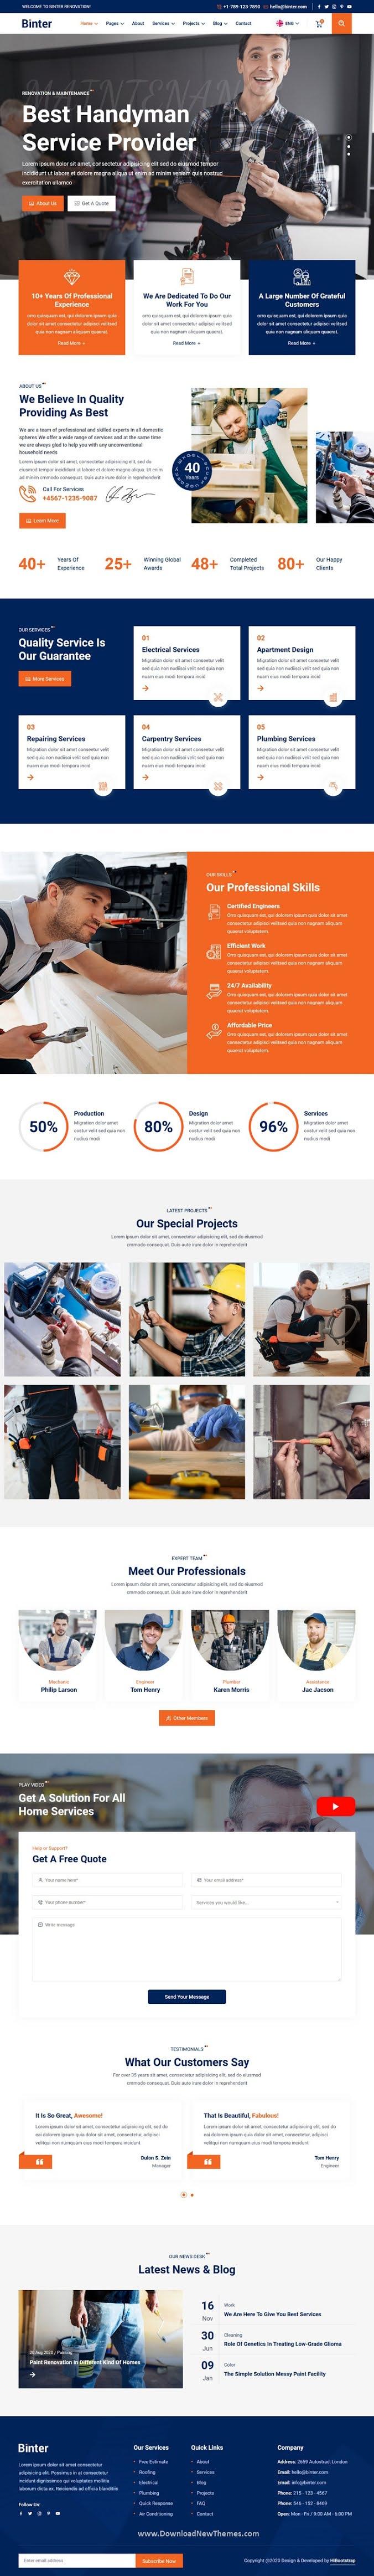 Renovation & Building Company HTML Template